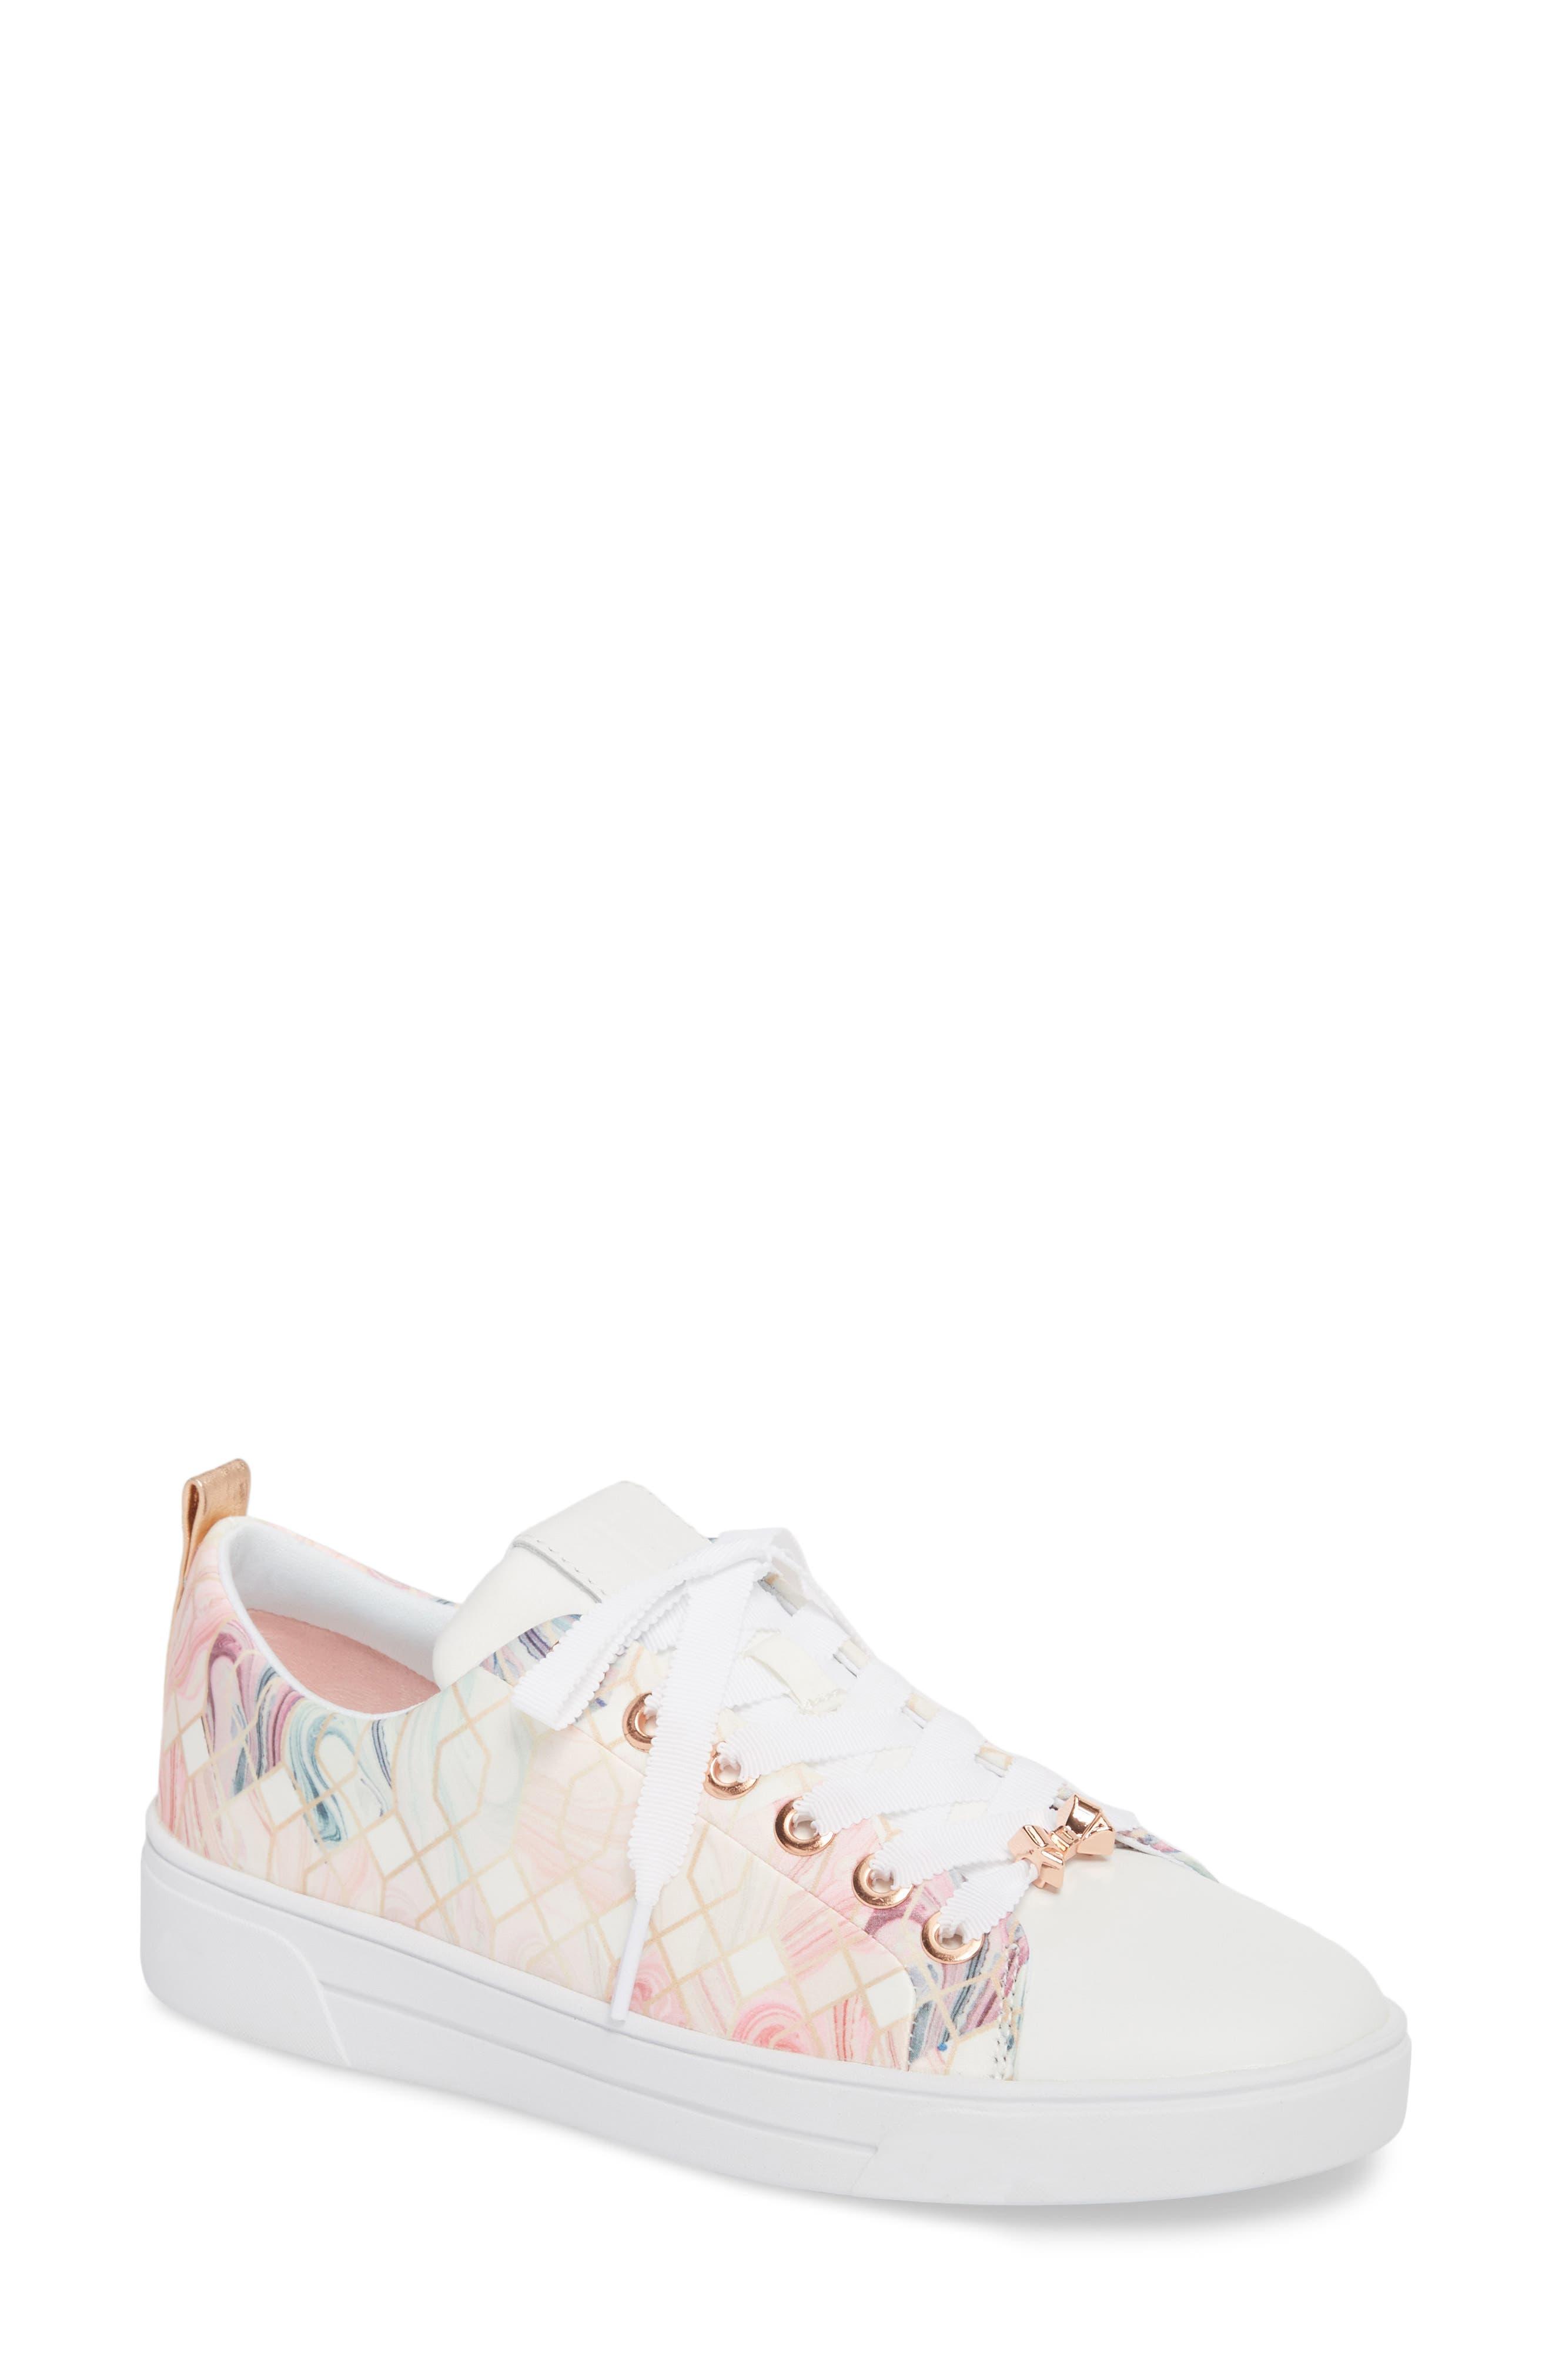 Ahfira Sneaker,                             Main thumbnail 1, color,                             Sea Of Clouds Print Fabric